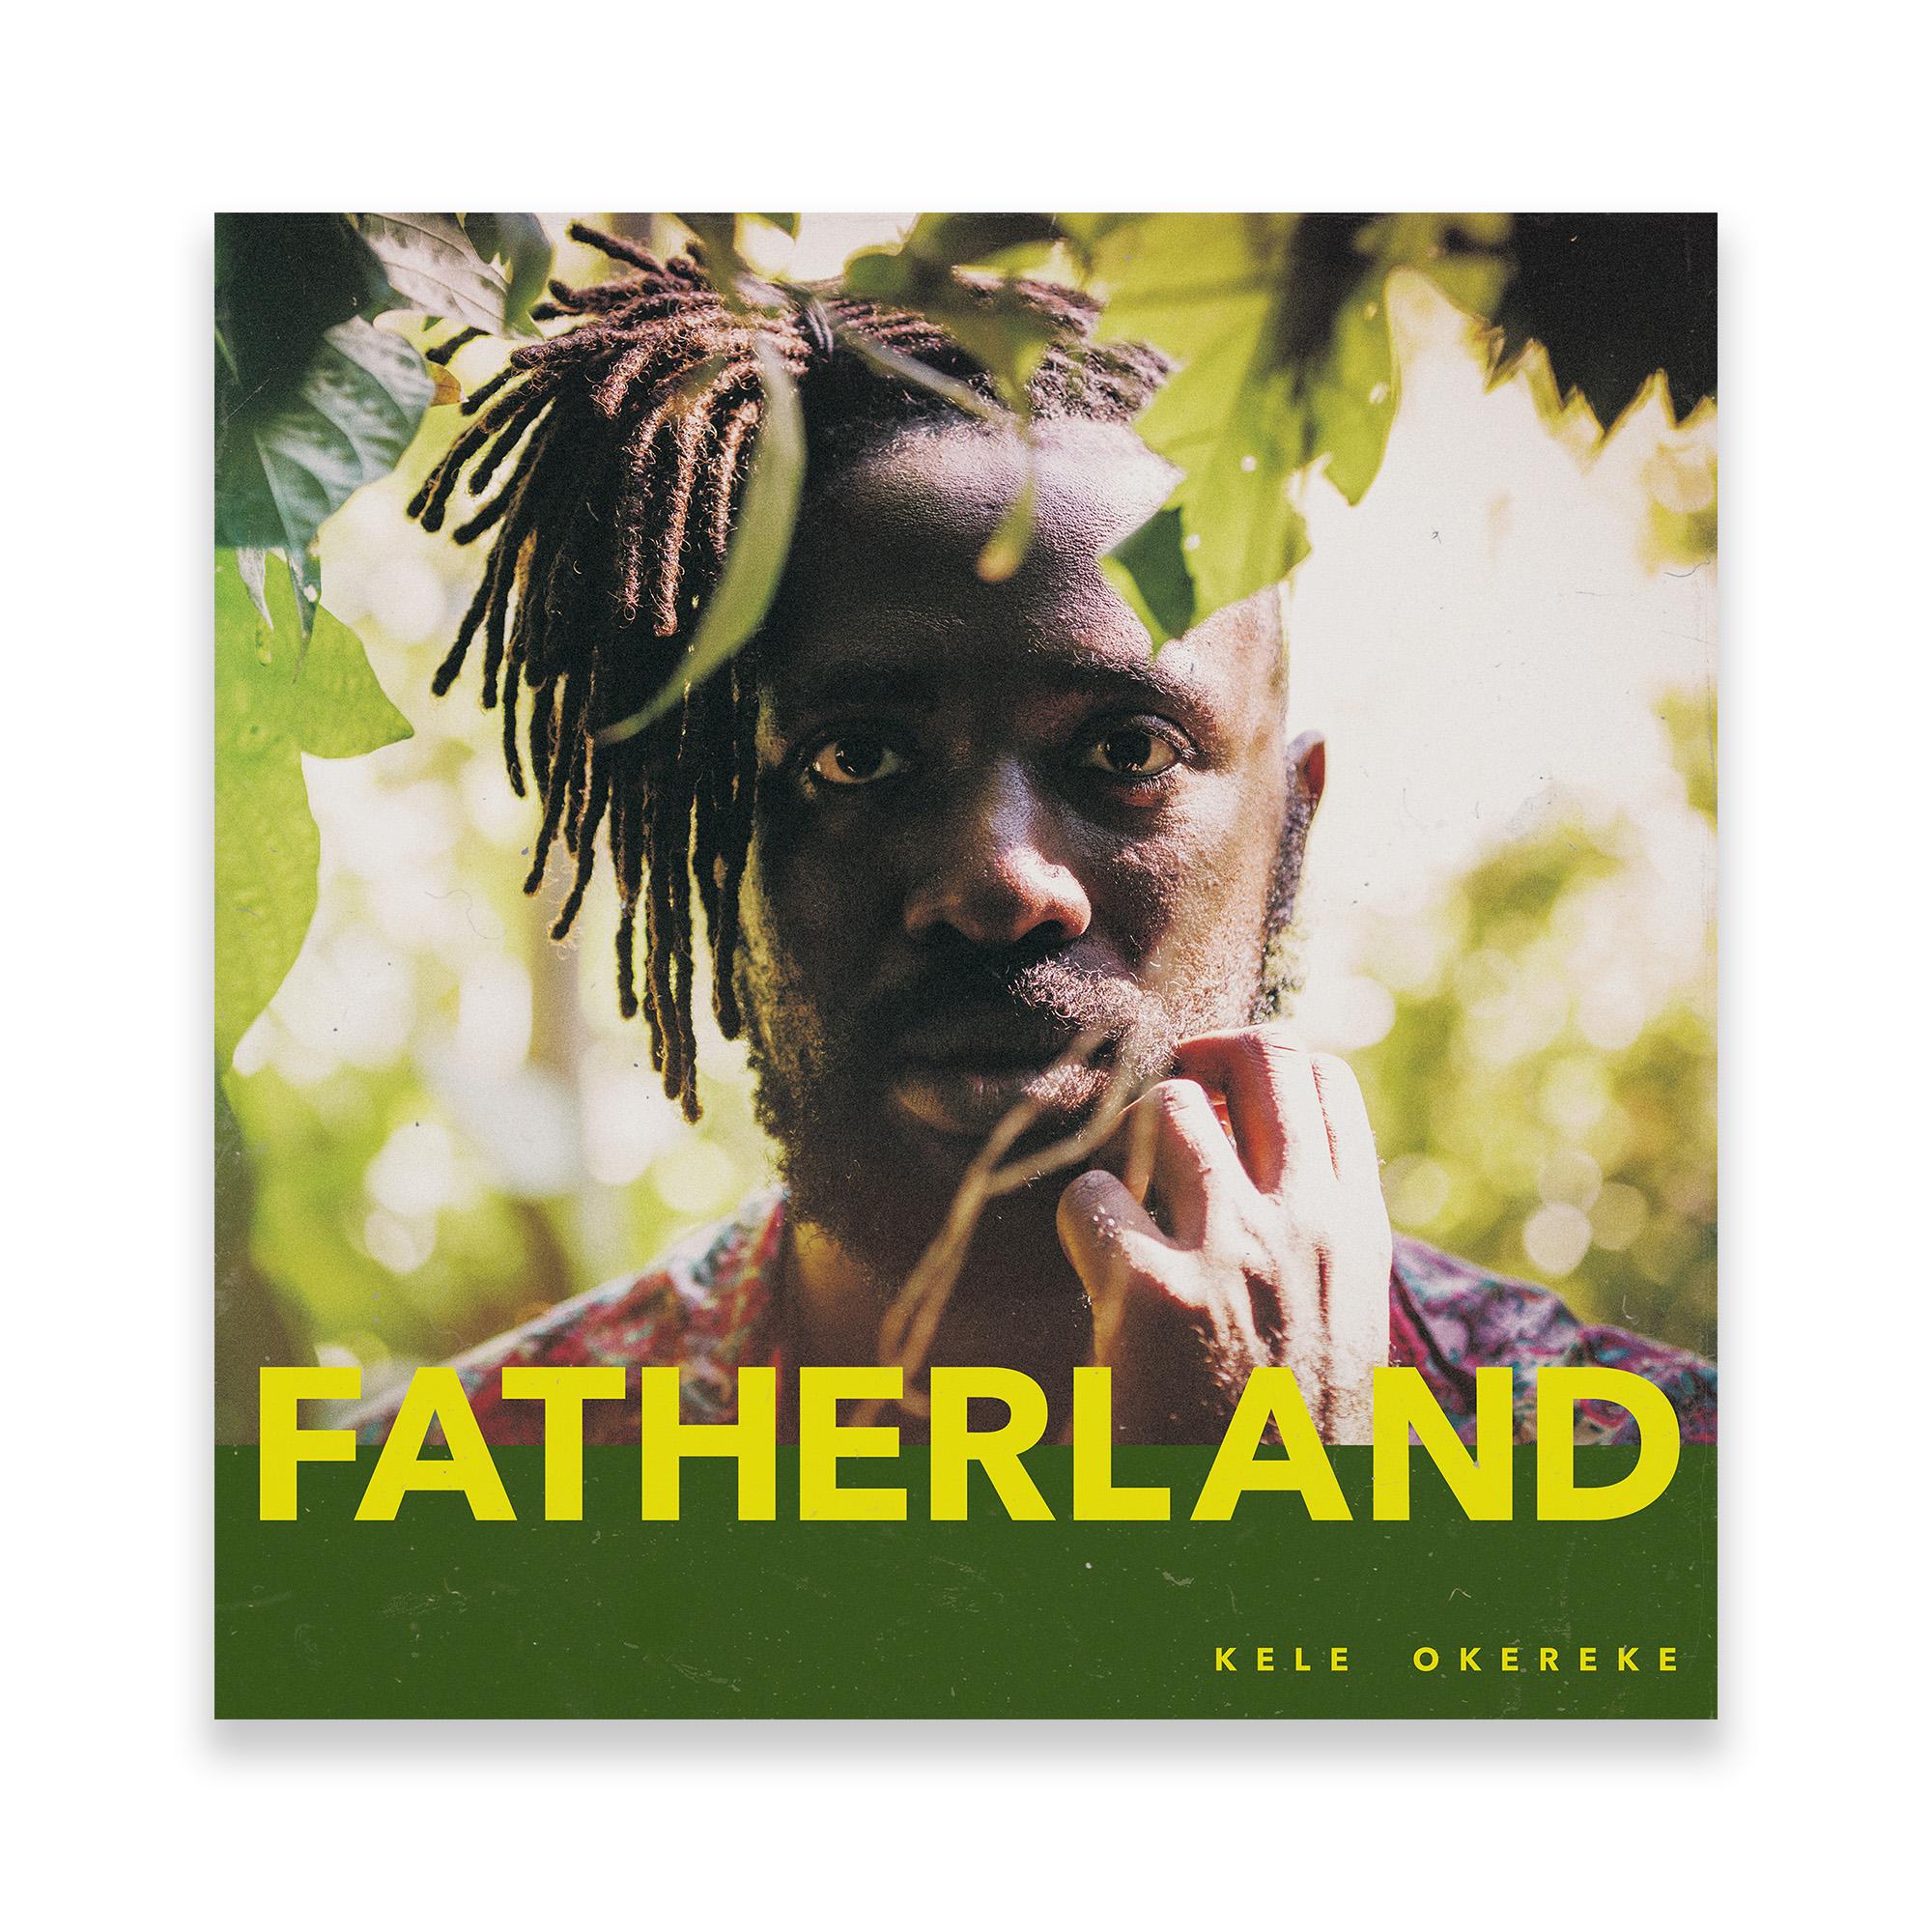 Kele Okereke - 'Fatherland' (BMG Music)